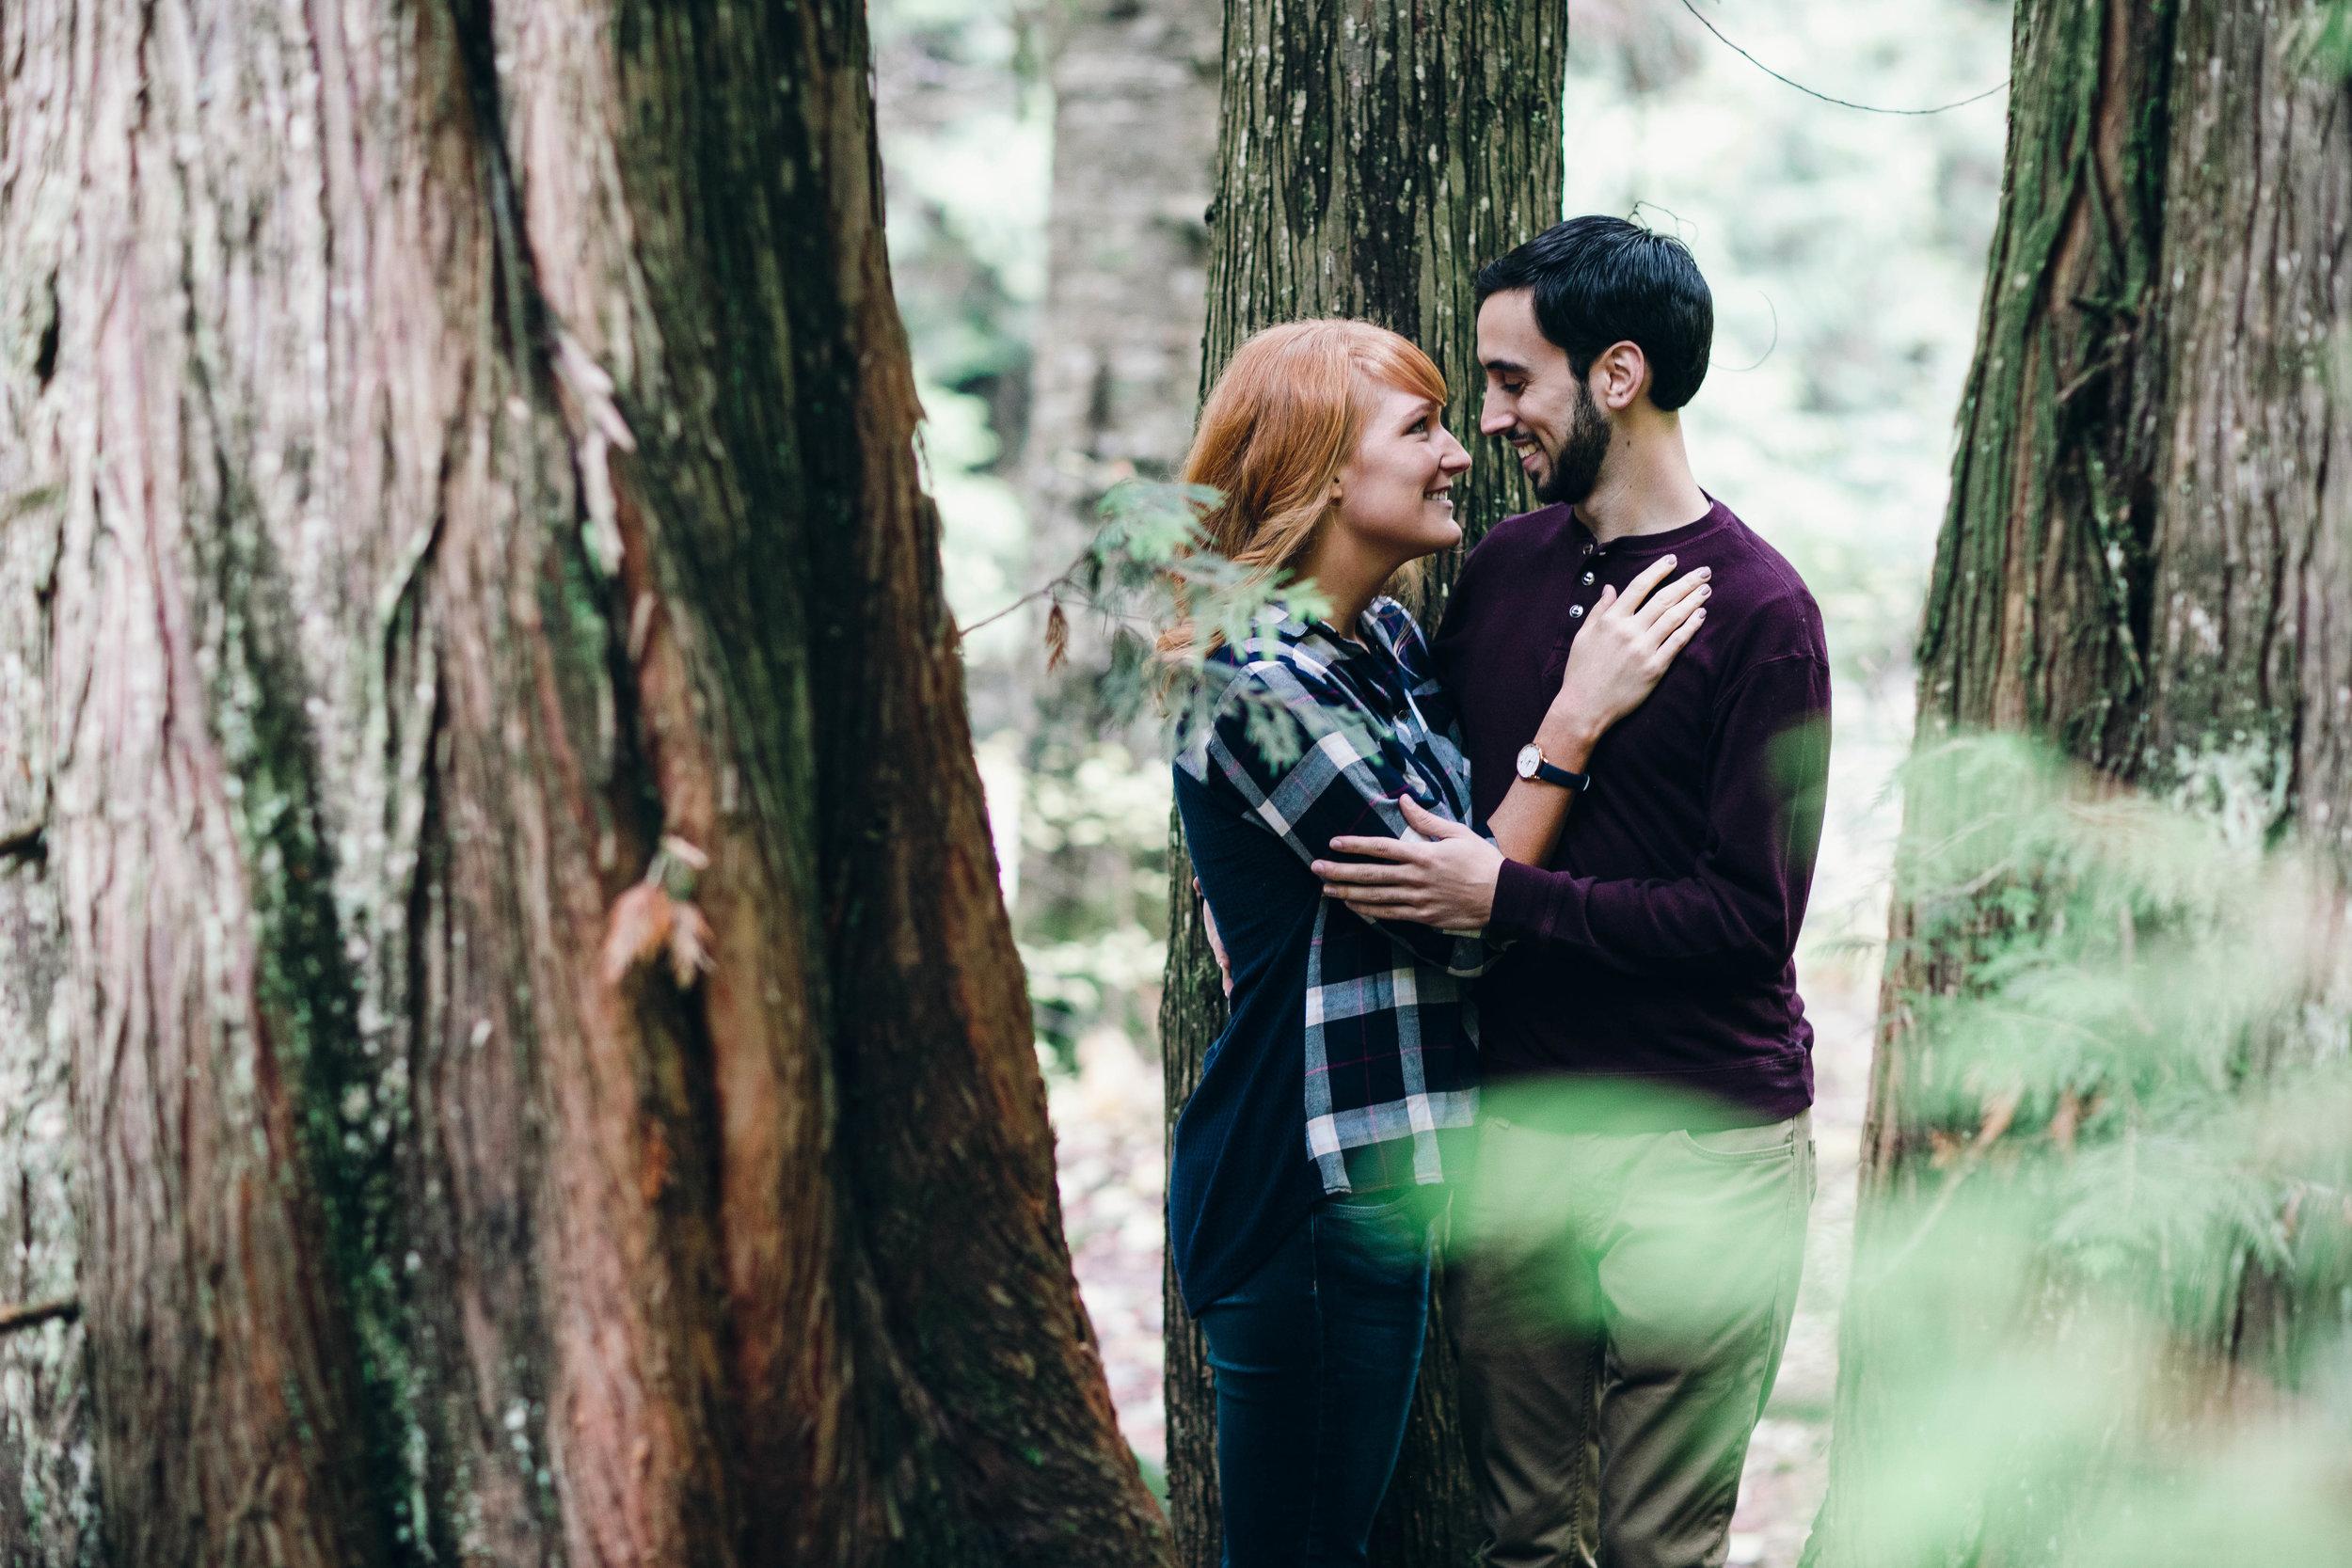 Ryan+Nicole_Franklin+Falls+Engagement_APW2016_11.JPG